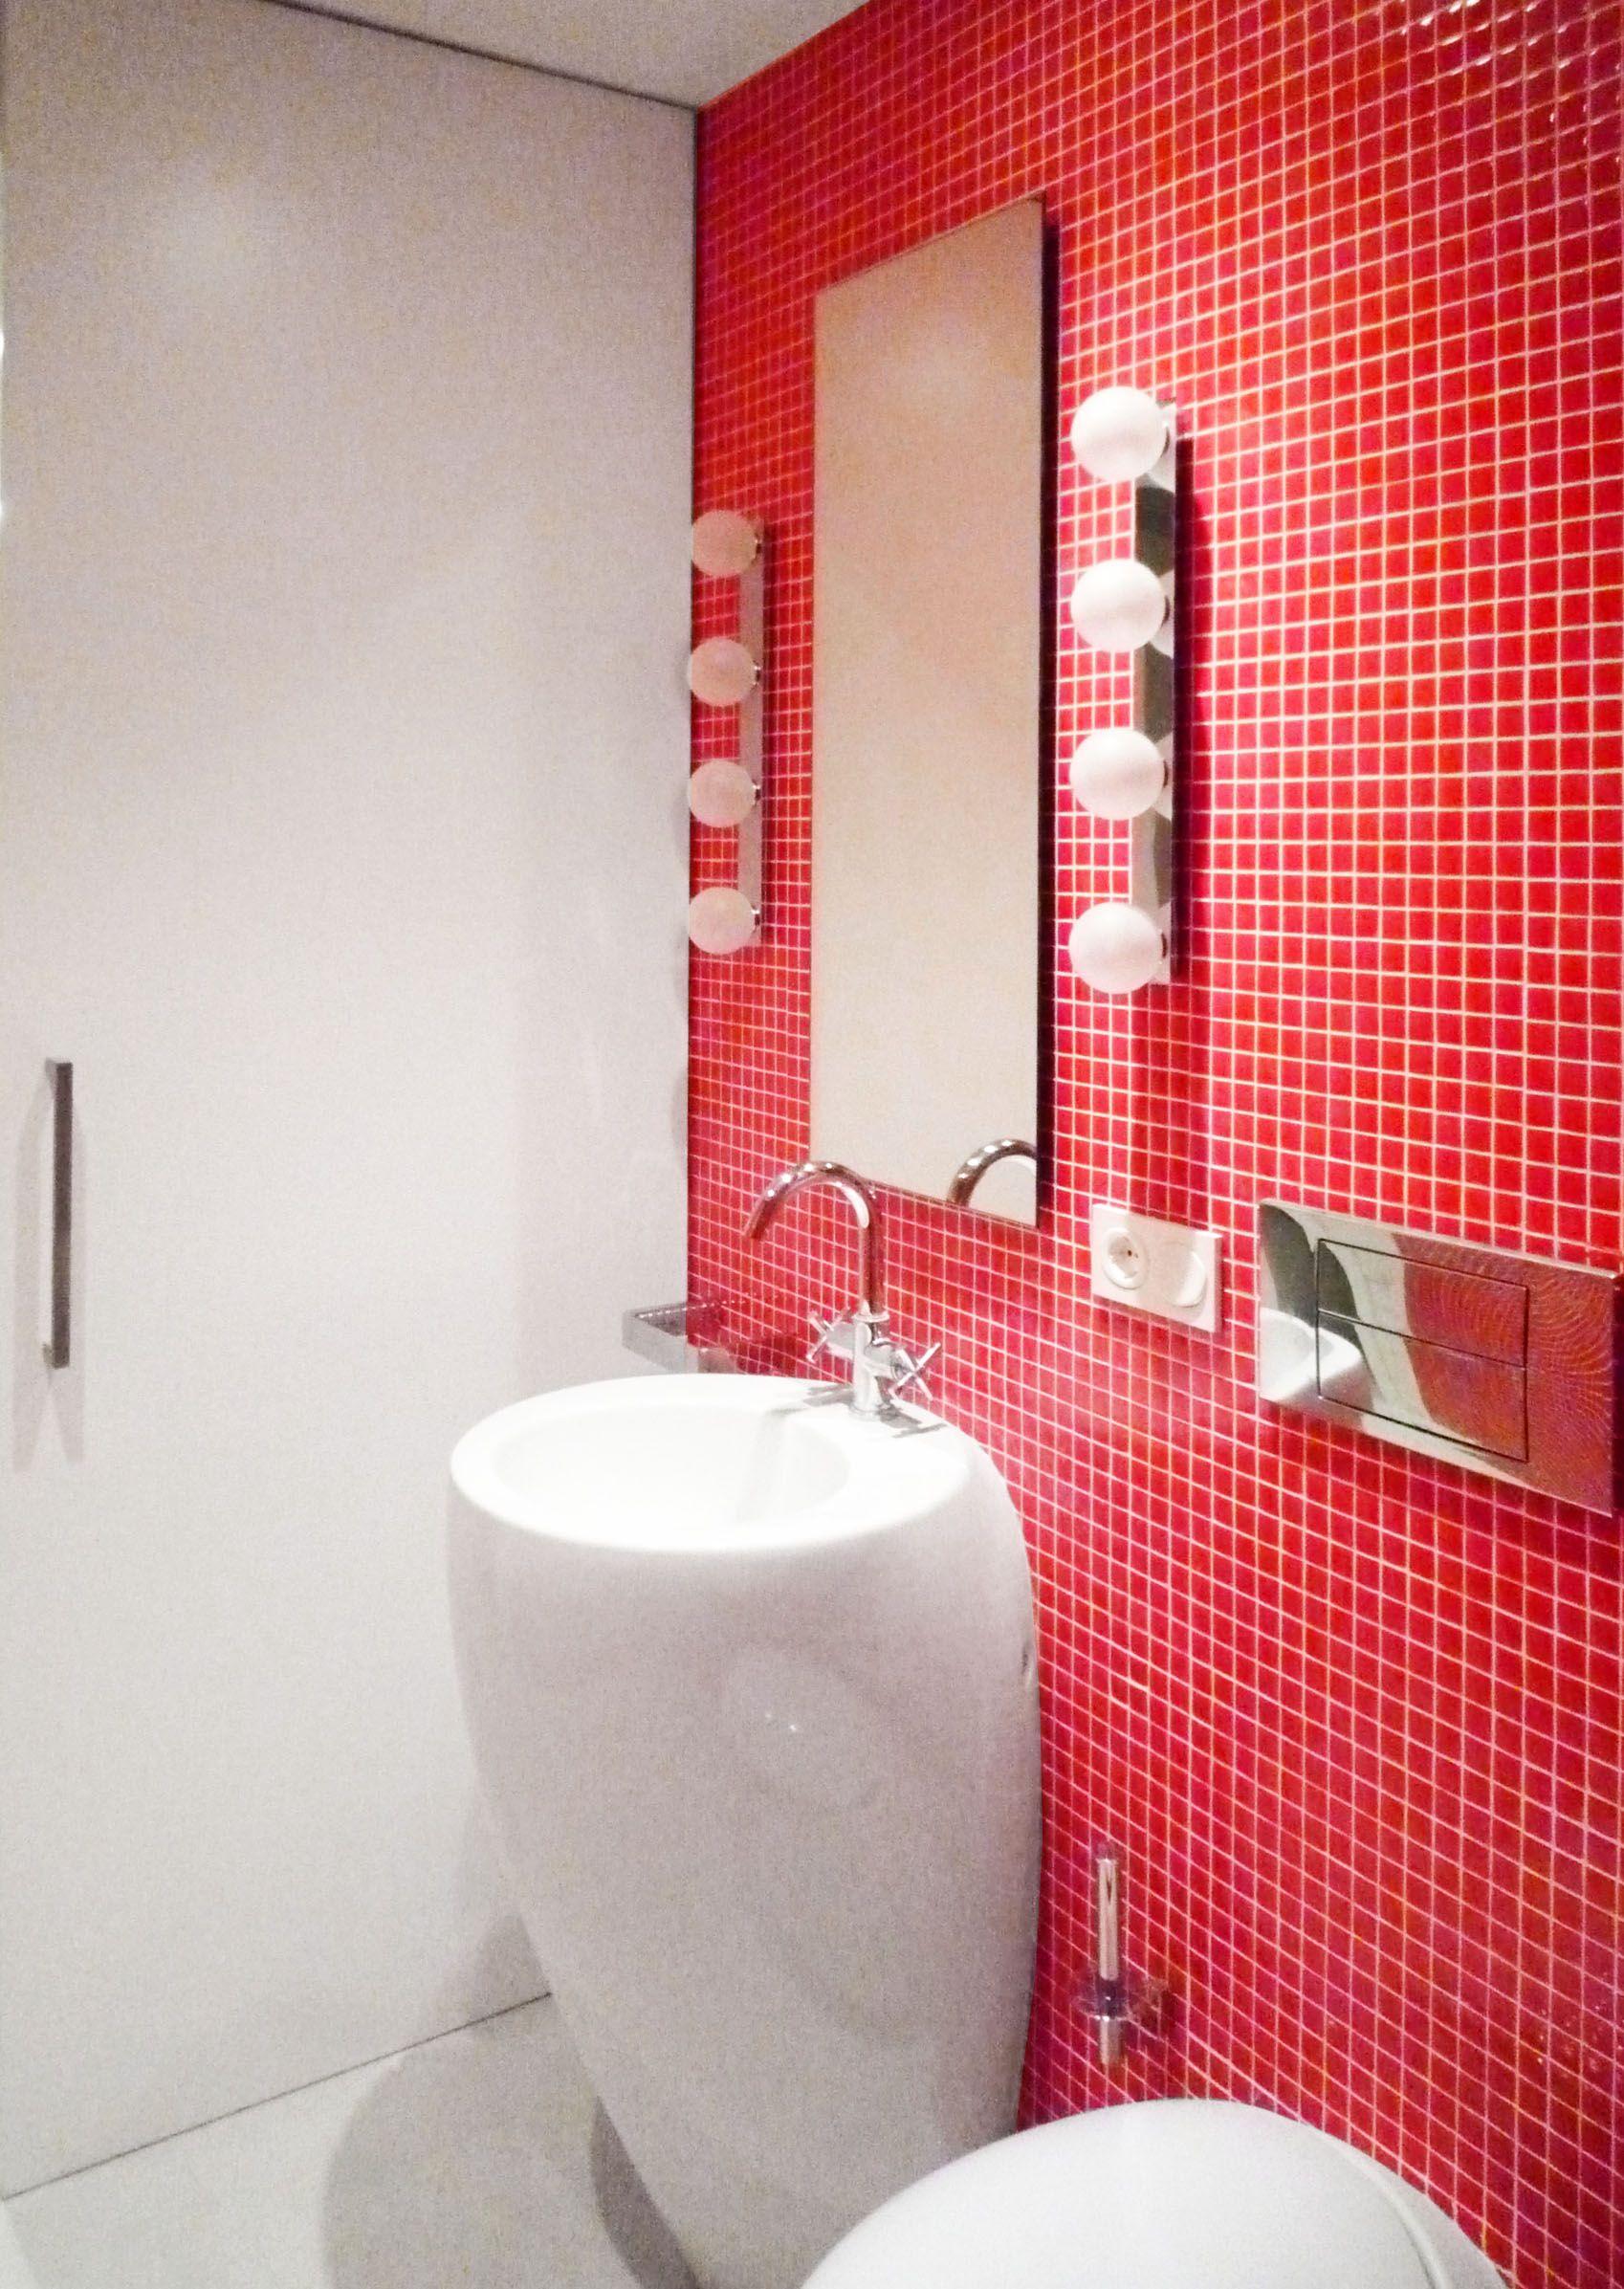 Baño Rojo Loft Barcelona 08023 Arquitectos Barcelona